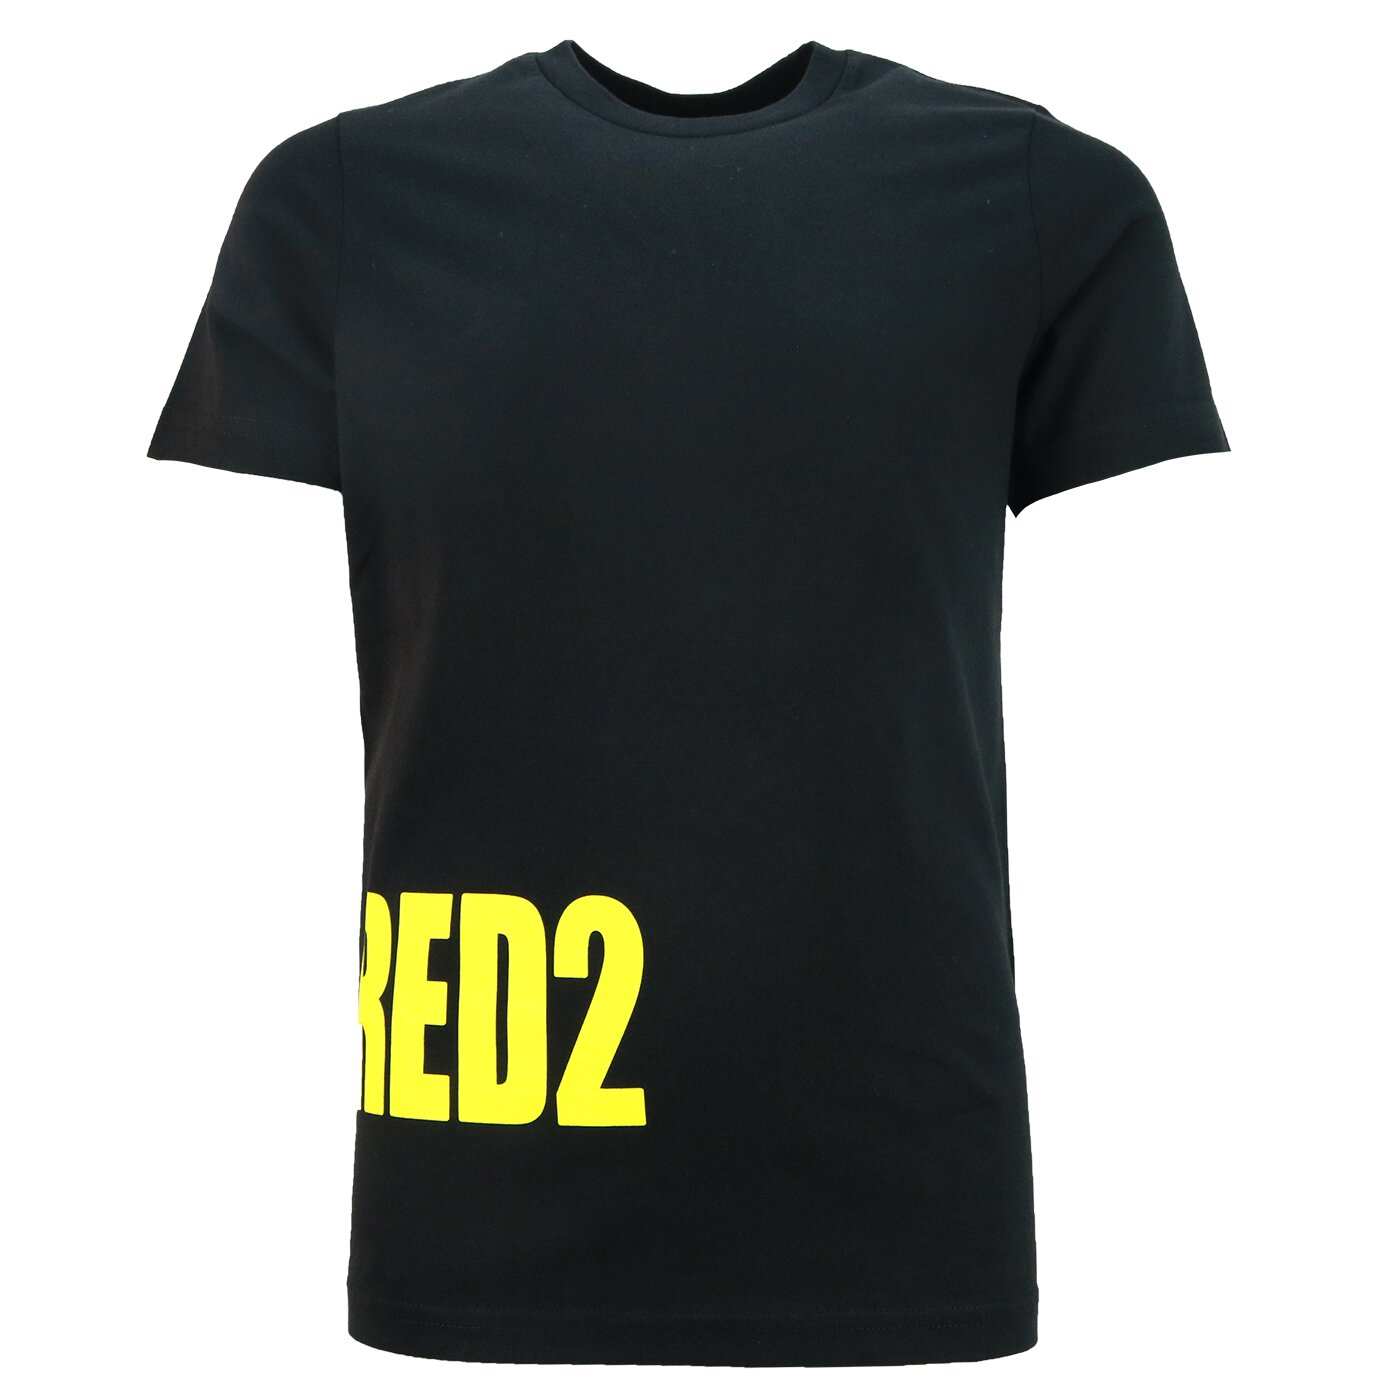 Dsquared2 Shirt zwart met geel side logo